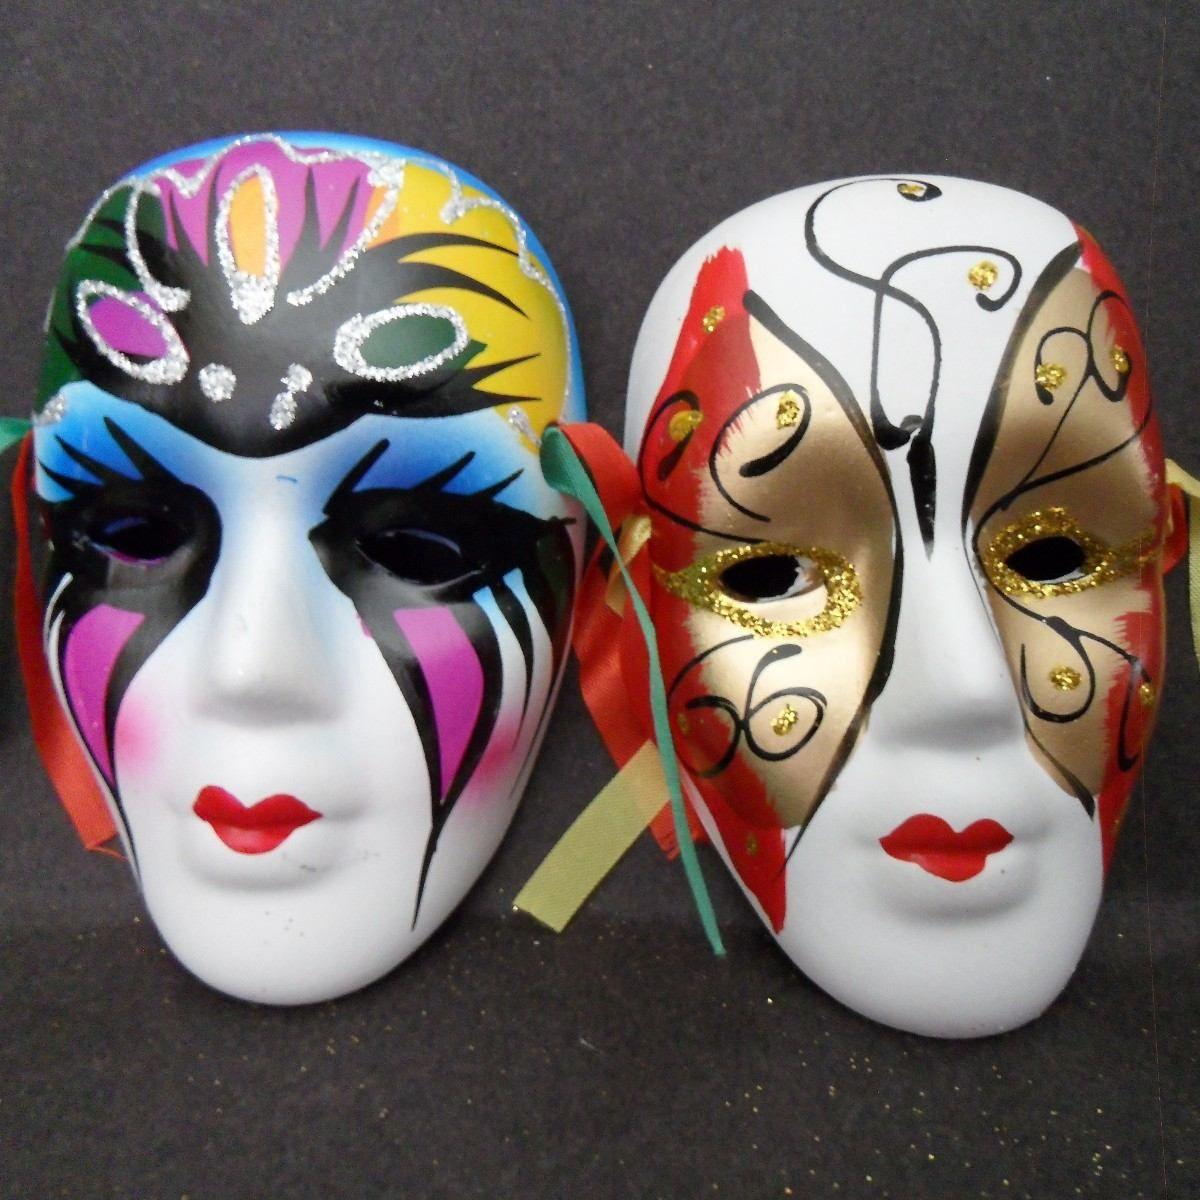 Hermosas Mascaras Decorativas Un Set De 6 Mascaras Medianas